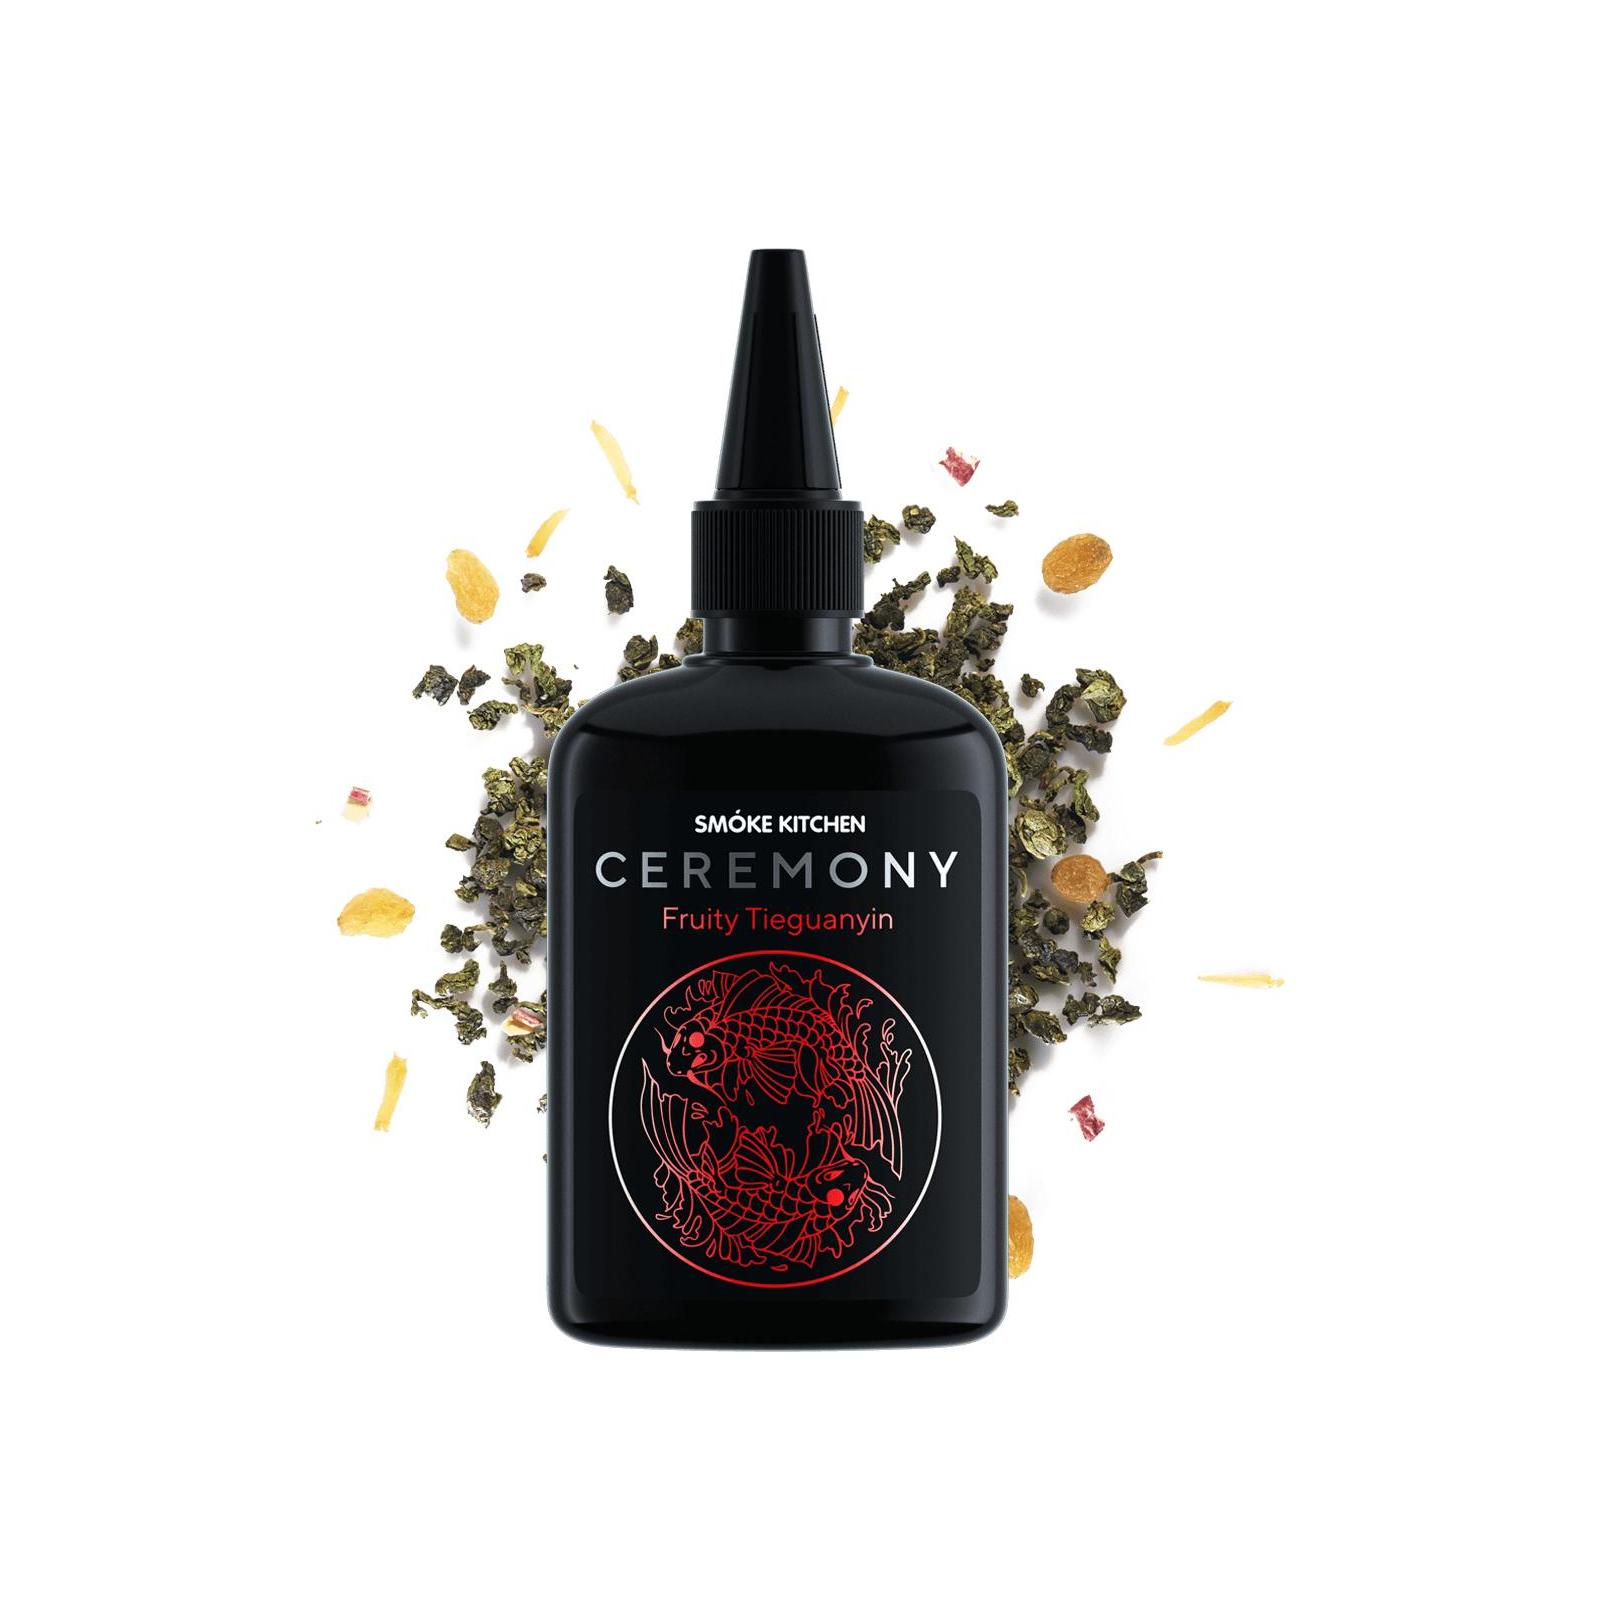 "Жидкость для электронных сигарет Smoke Kitchen Ceremony ""Fruity Tieguanyin"" 100 ml 0 мг/мл (CRM-FT-0)"